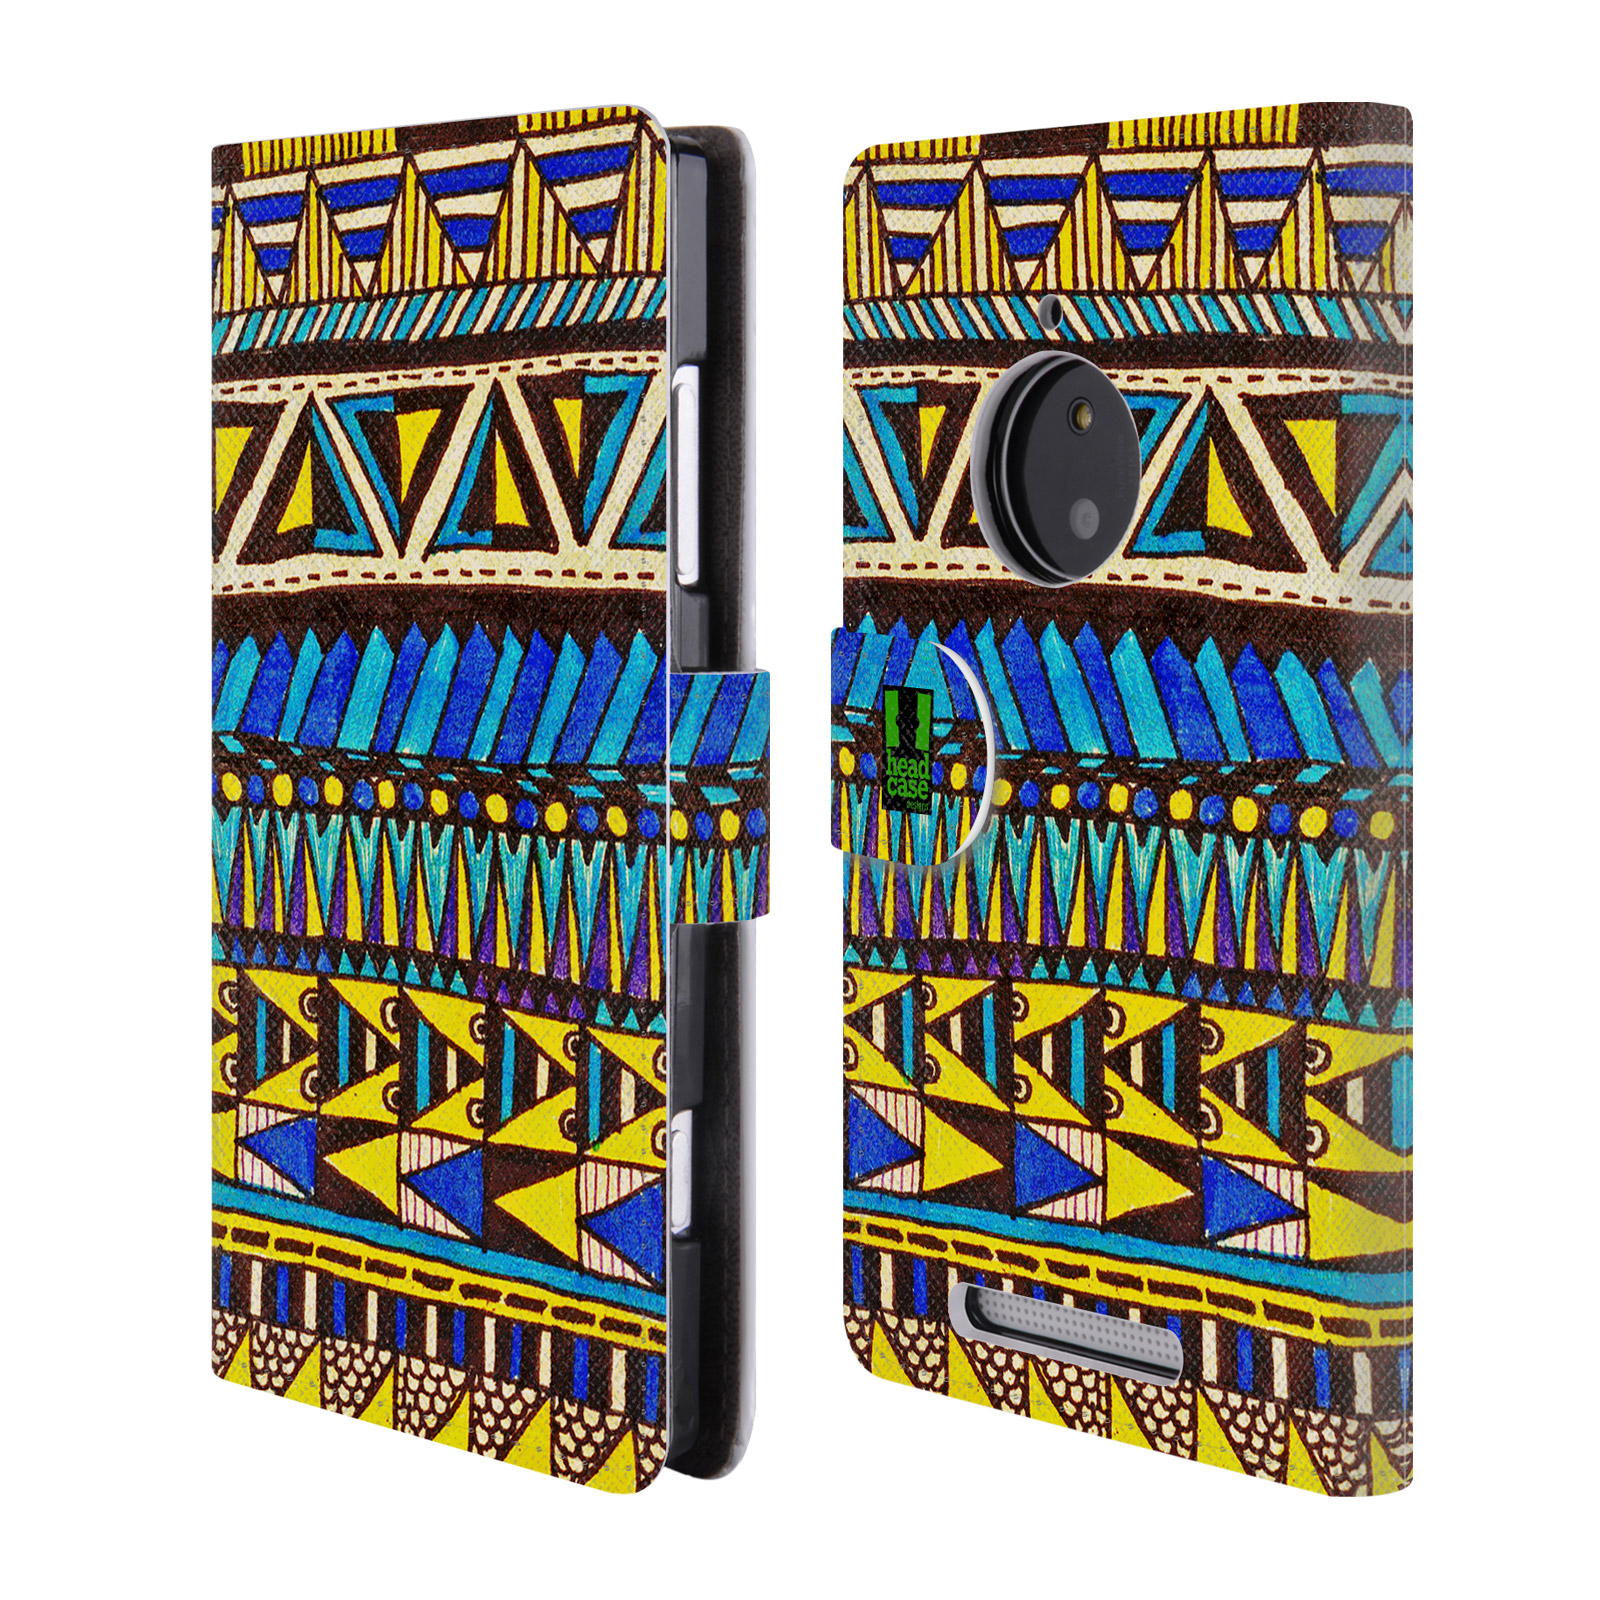 HEAD CASE Flipové pouzdro pro mobil NOKIA LUMIA 830 Barevná aztécká čmáranice modrá